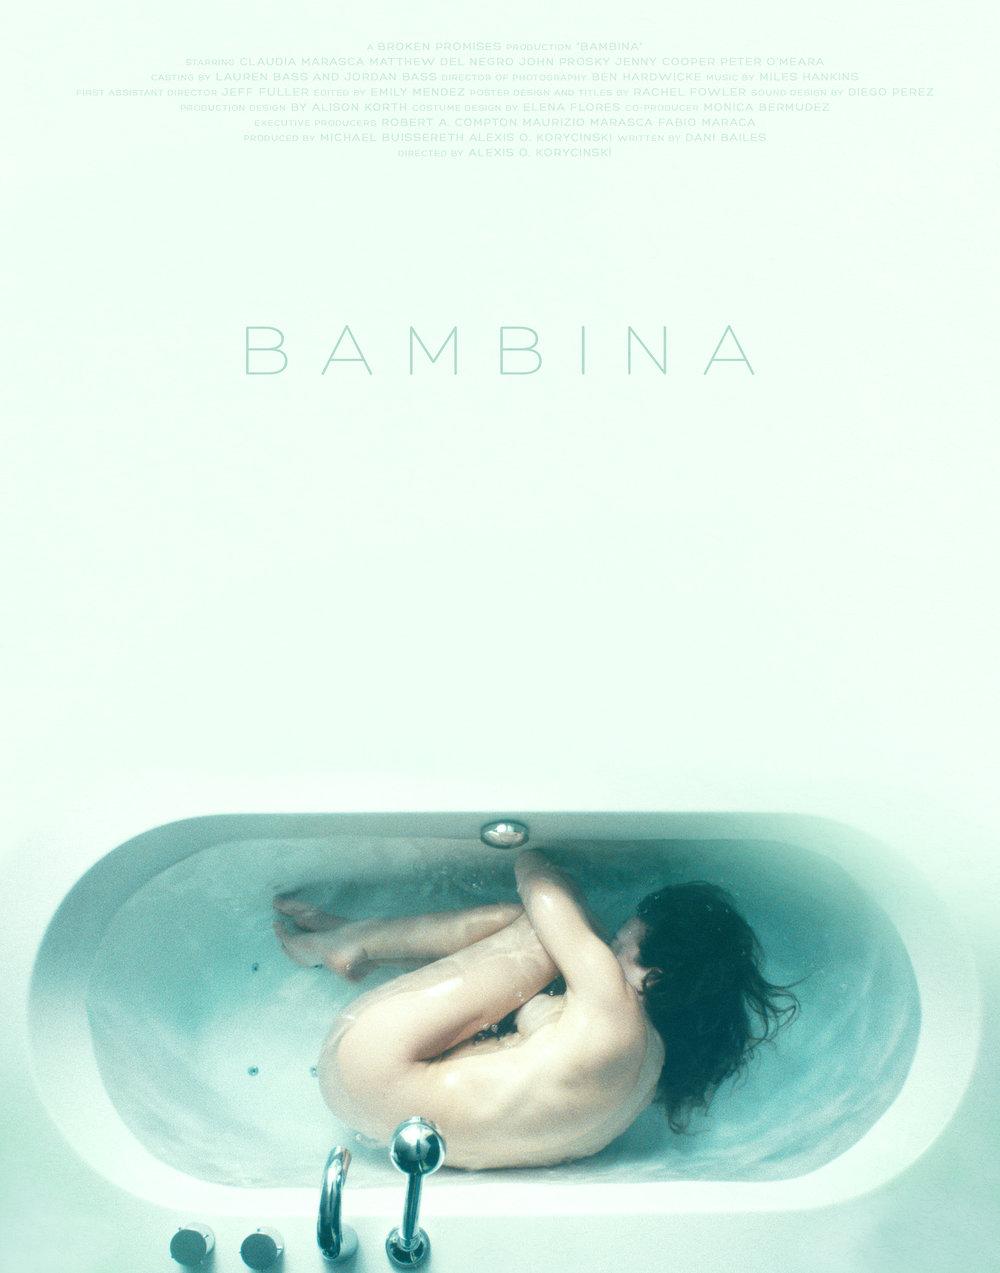 BAMBINA_poster_003_103016.jpg